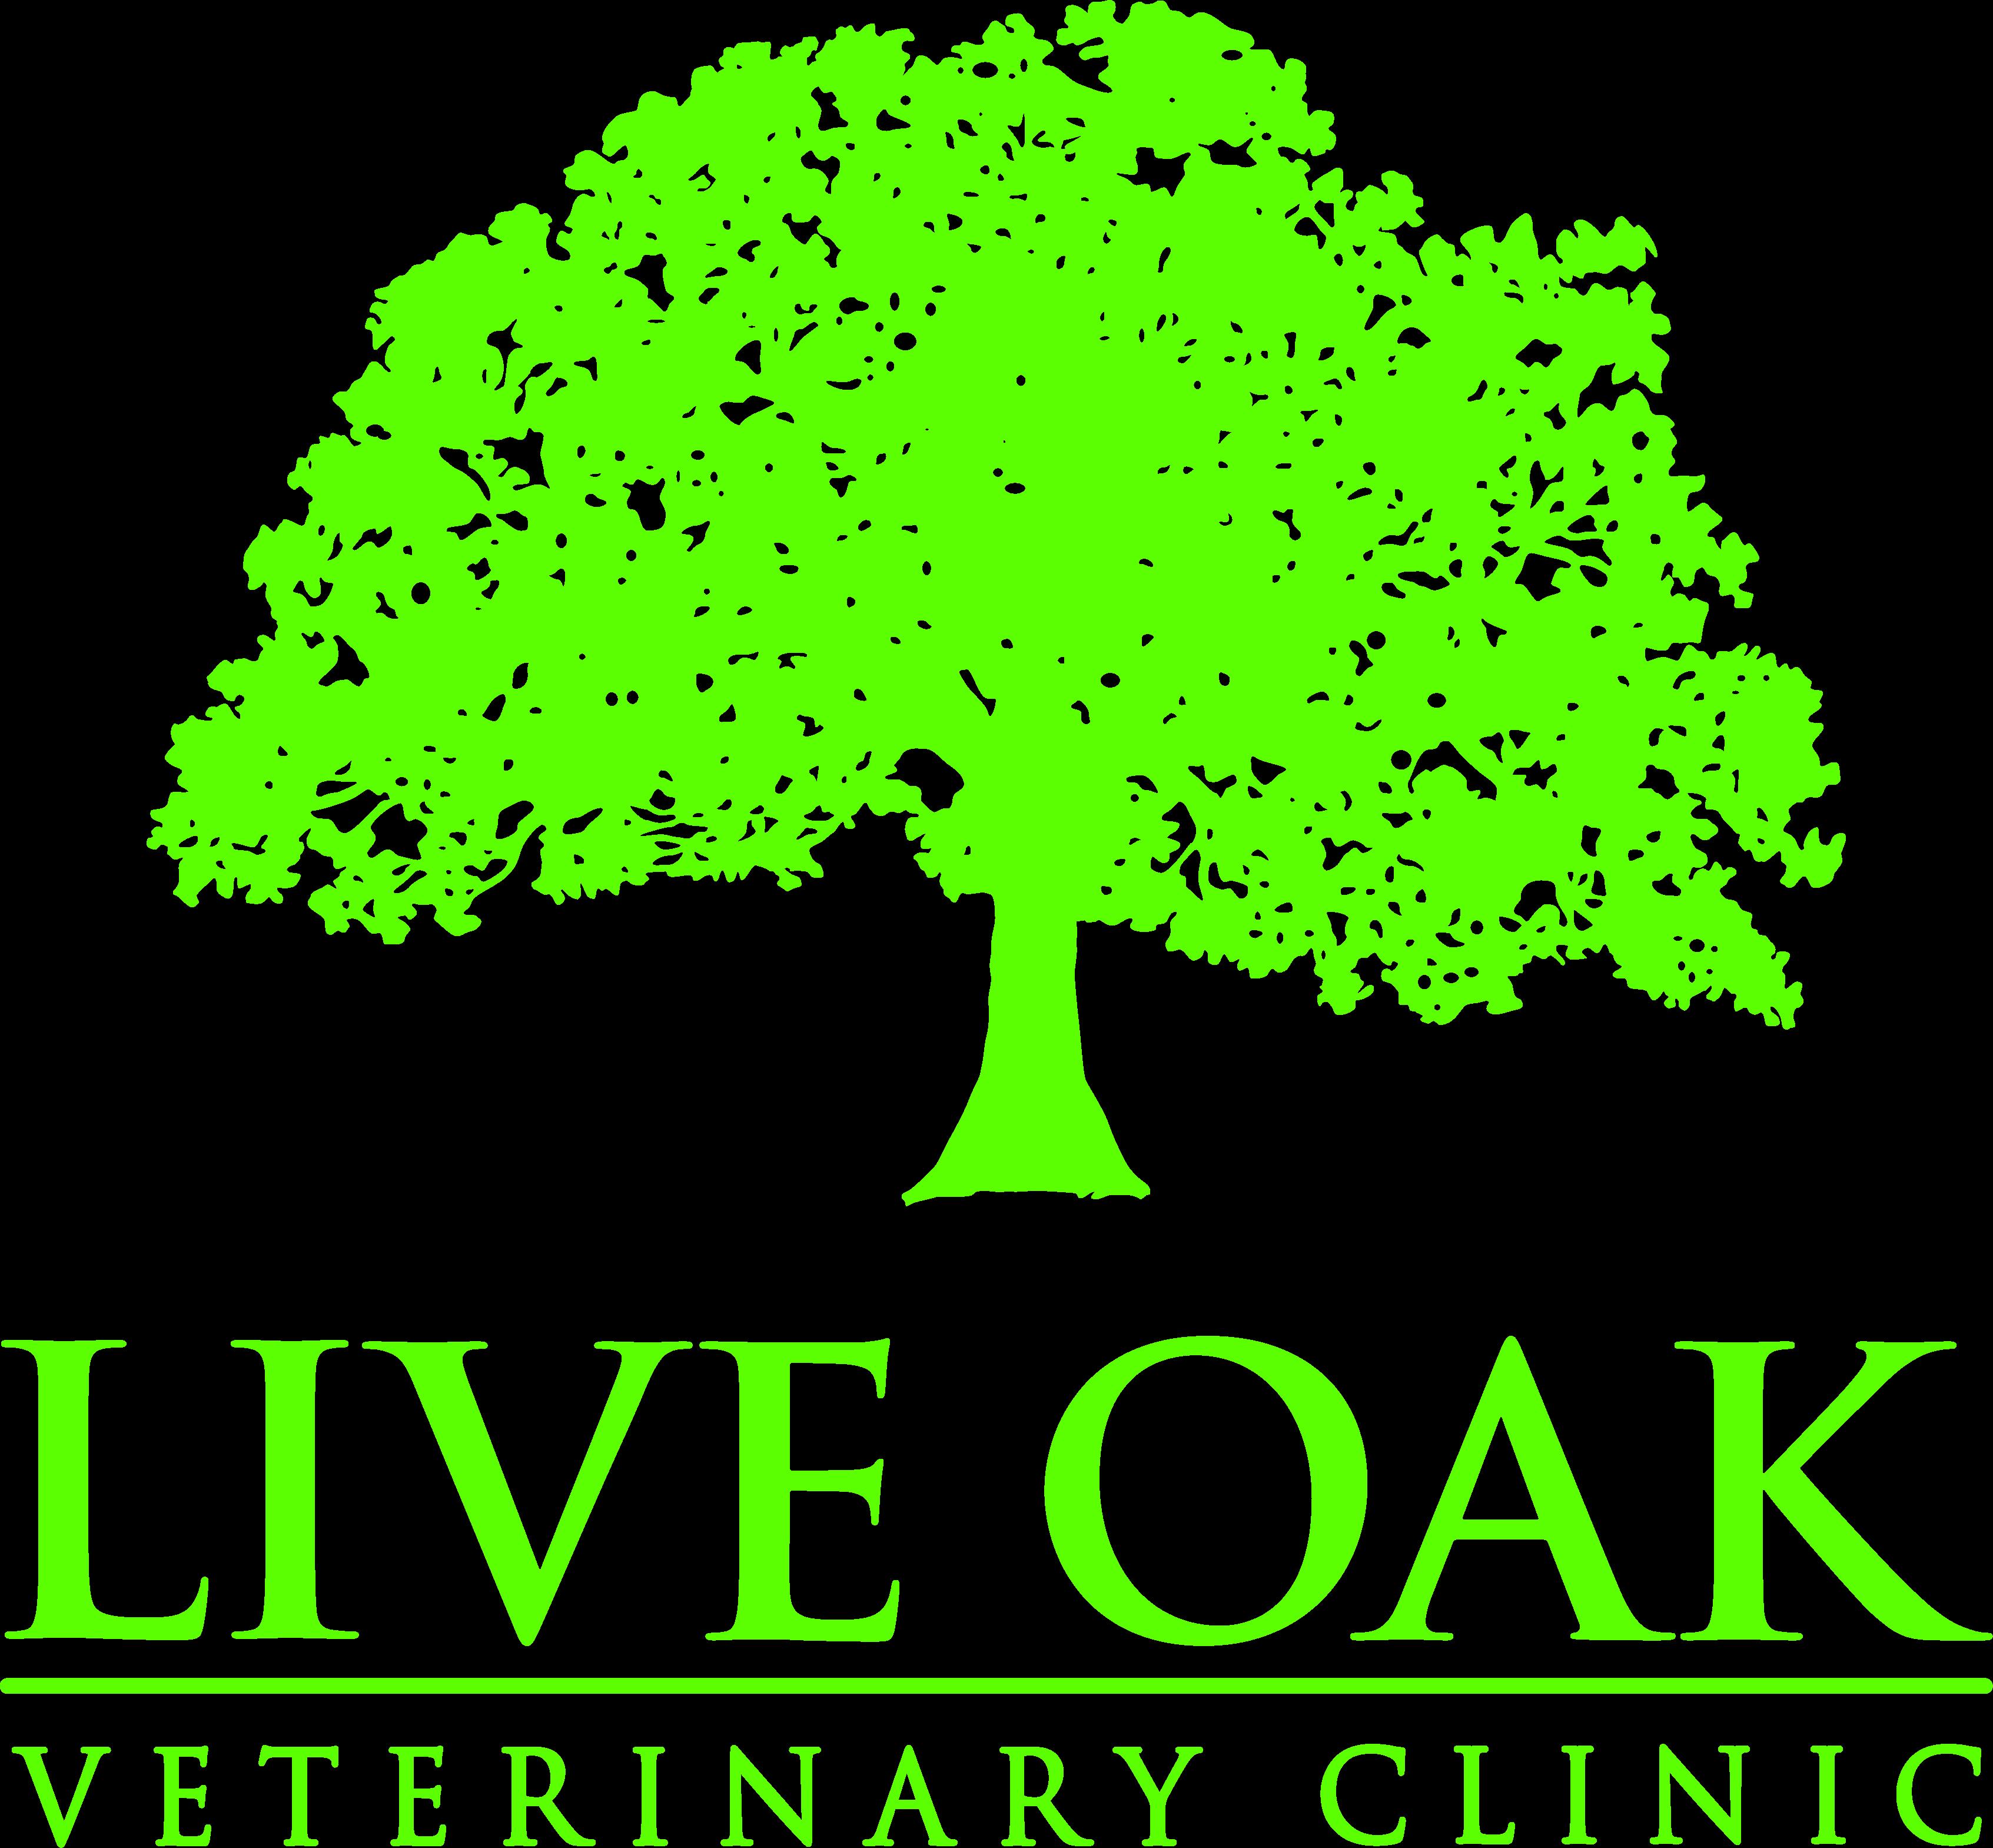 Live Oak Veterinary Clinic Veterinarian In Jacksboro Tx